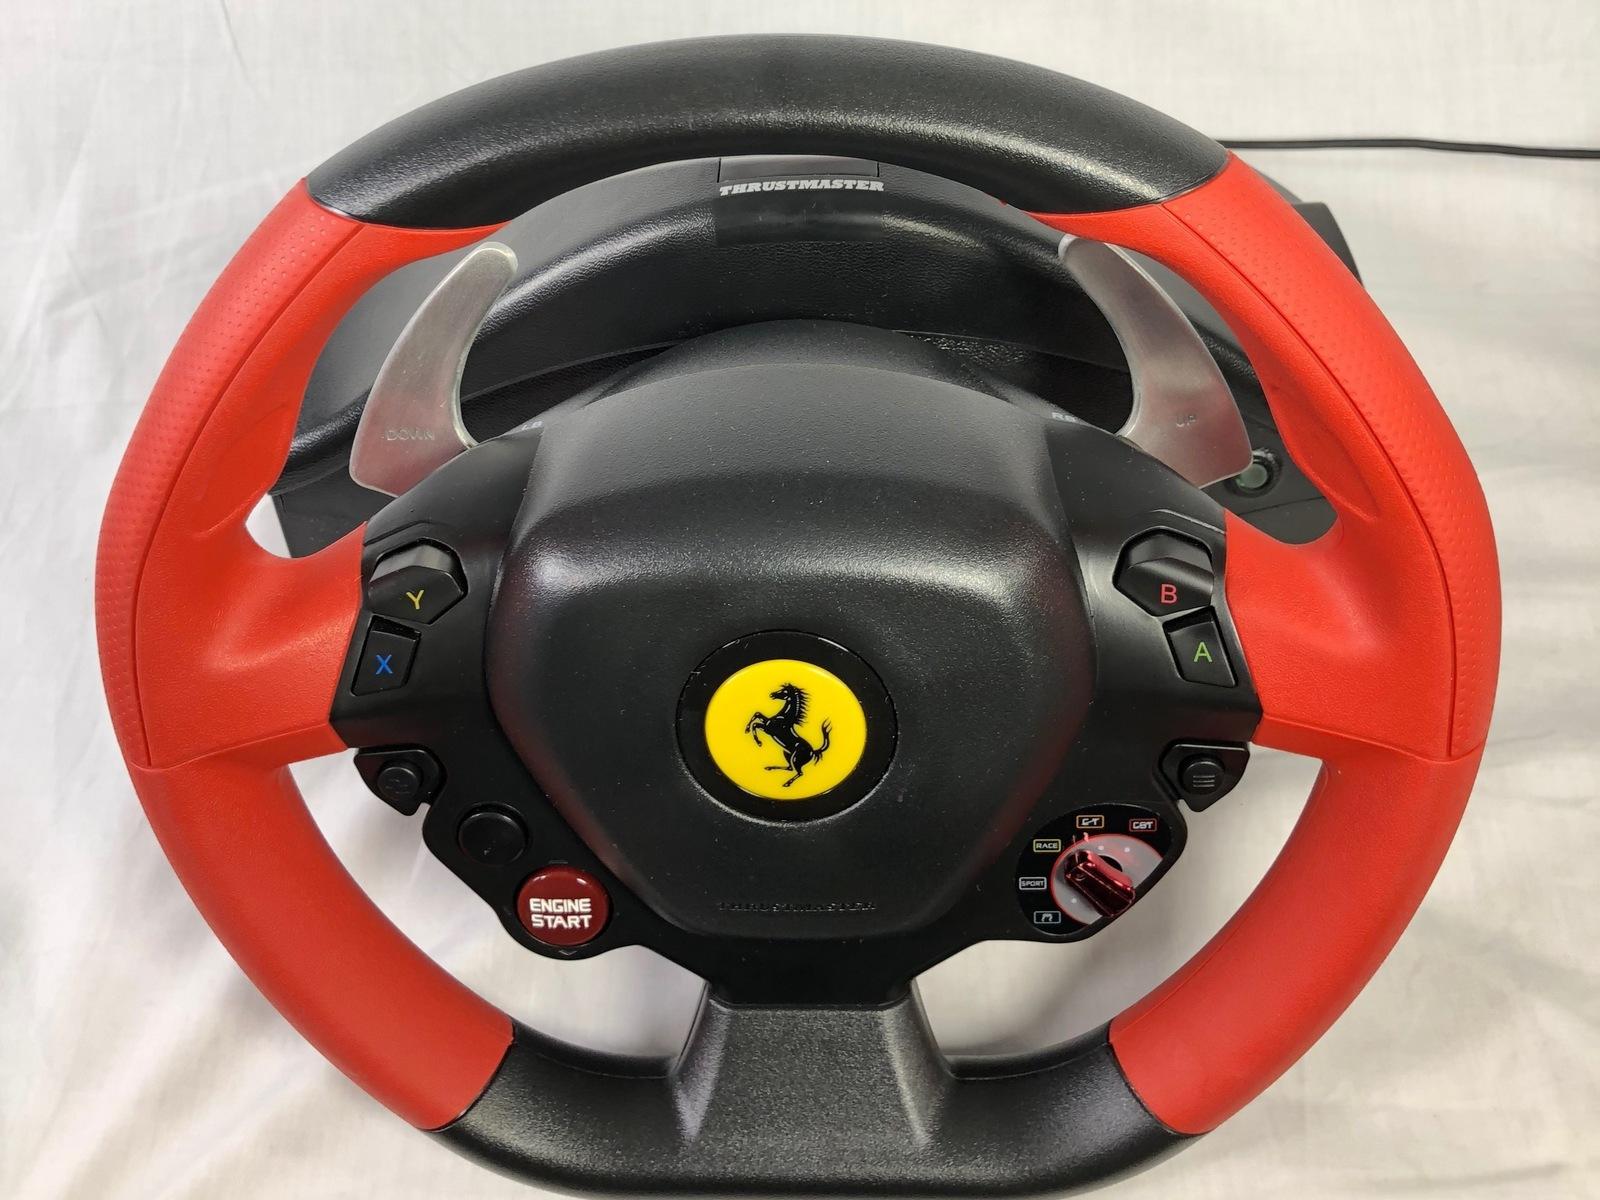 Thrustmaster Ferrari 458 Spider Racing Wheel - iFixit